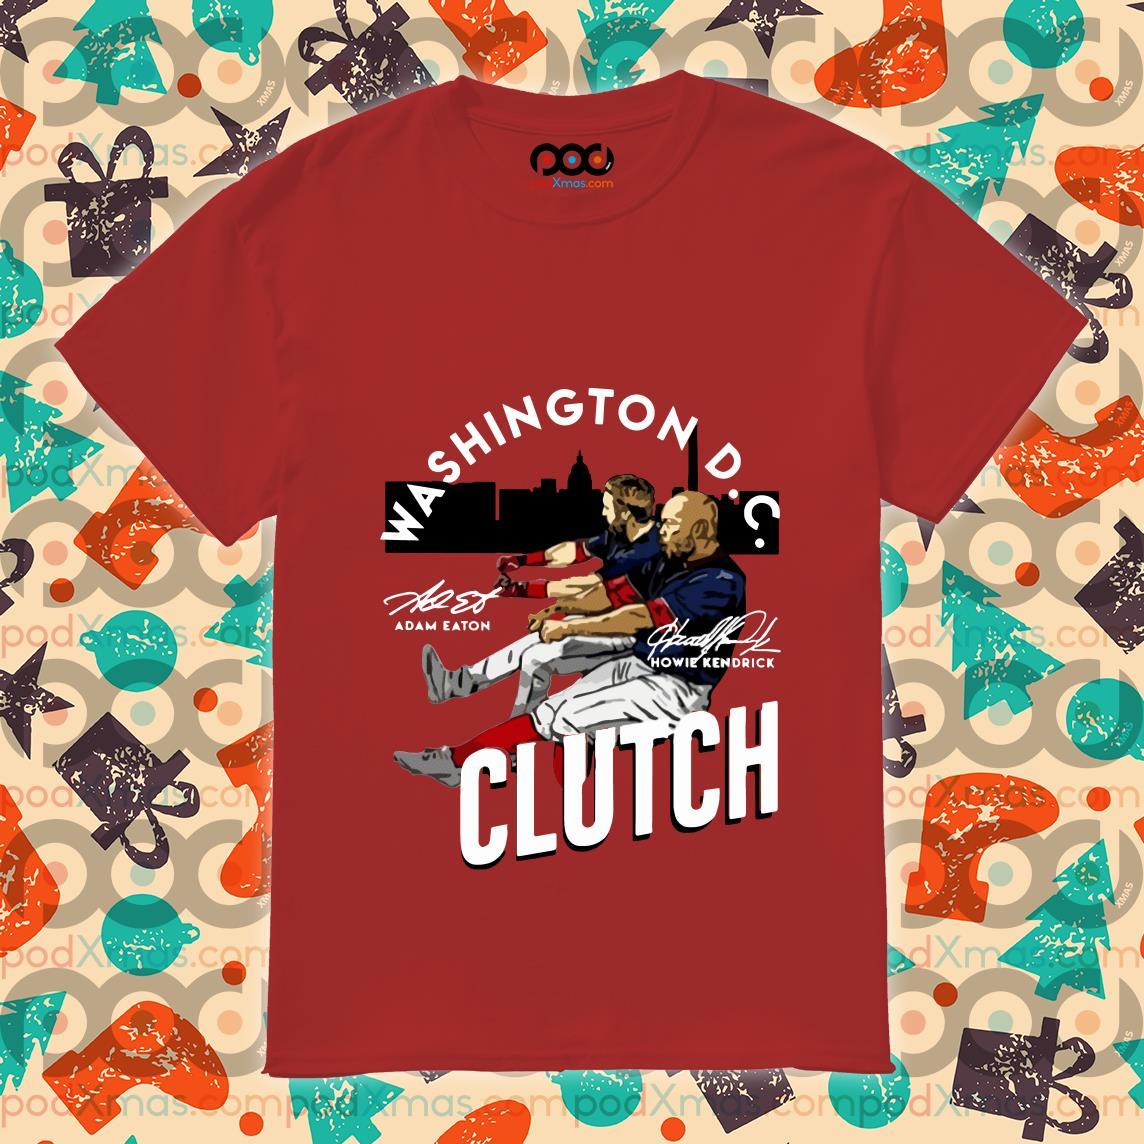 Washington D.C Clutch shirt